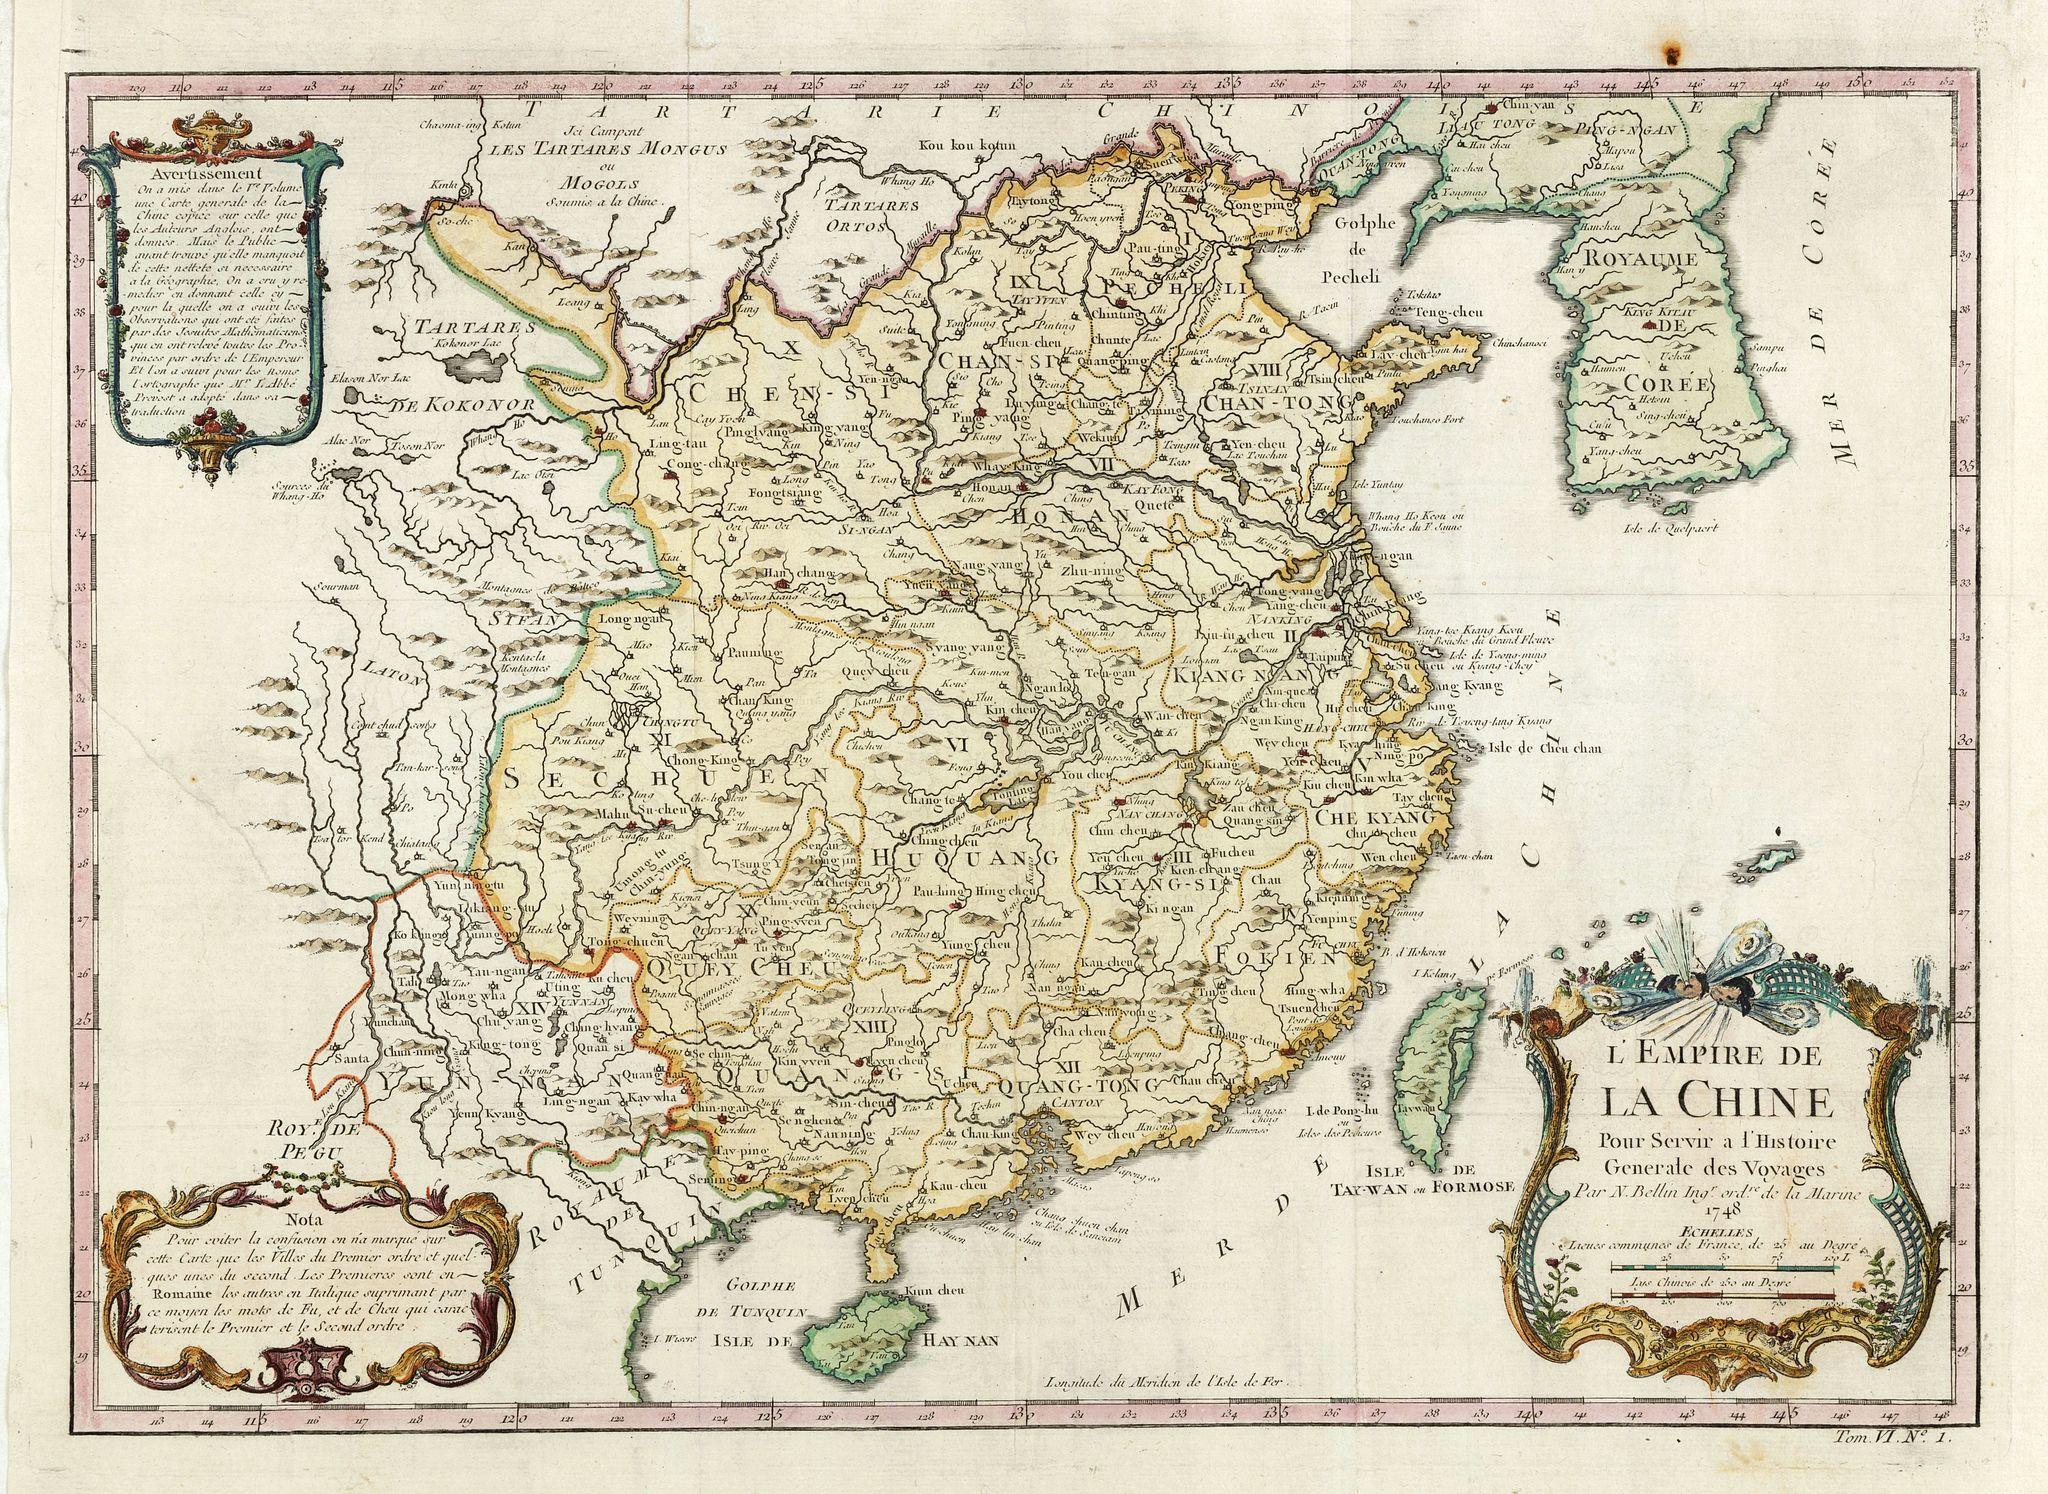 BELLIN, J.N. -  L'Empire de la Chine.